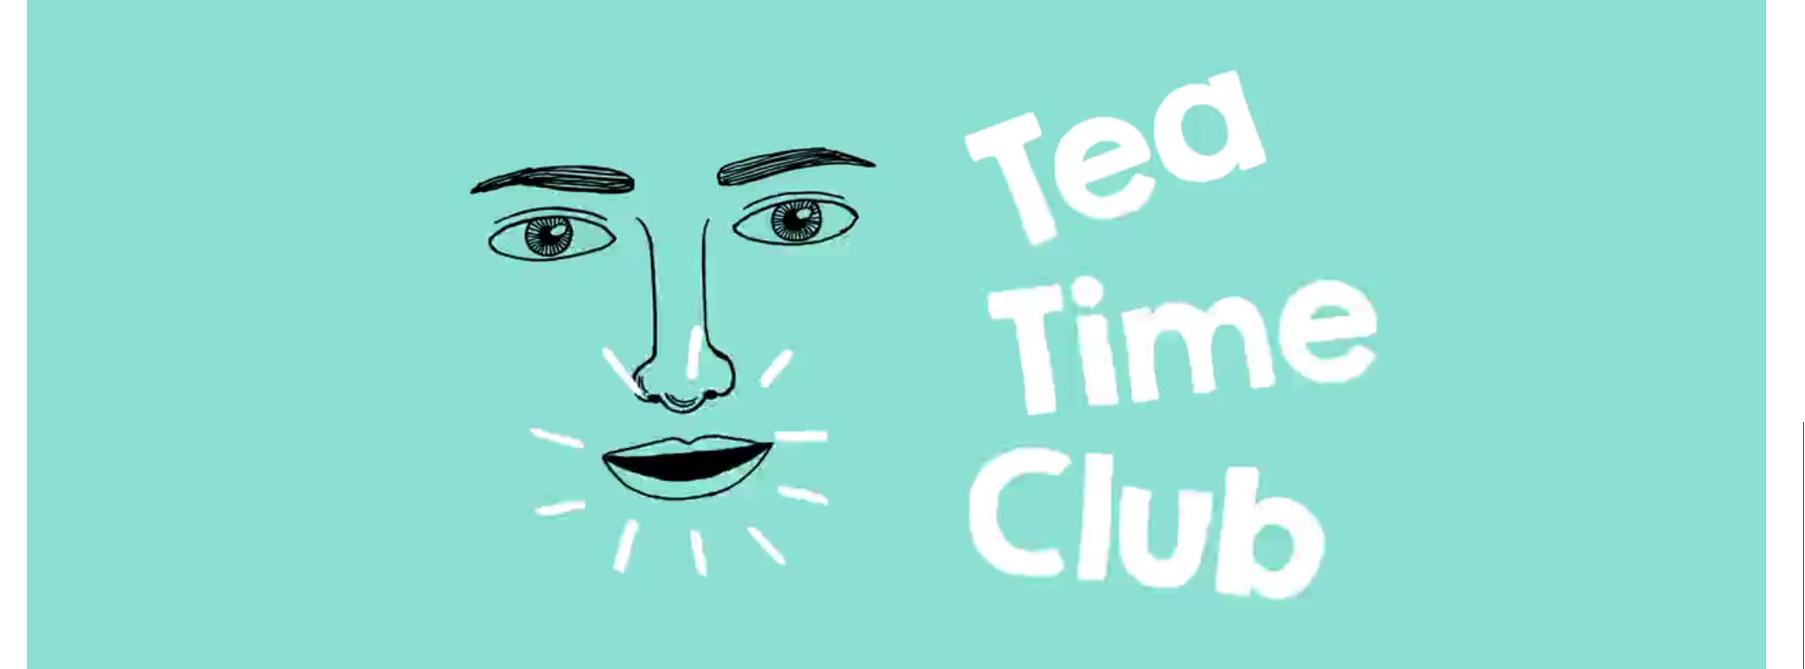 TTC photo